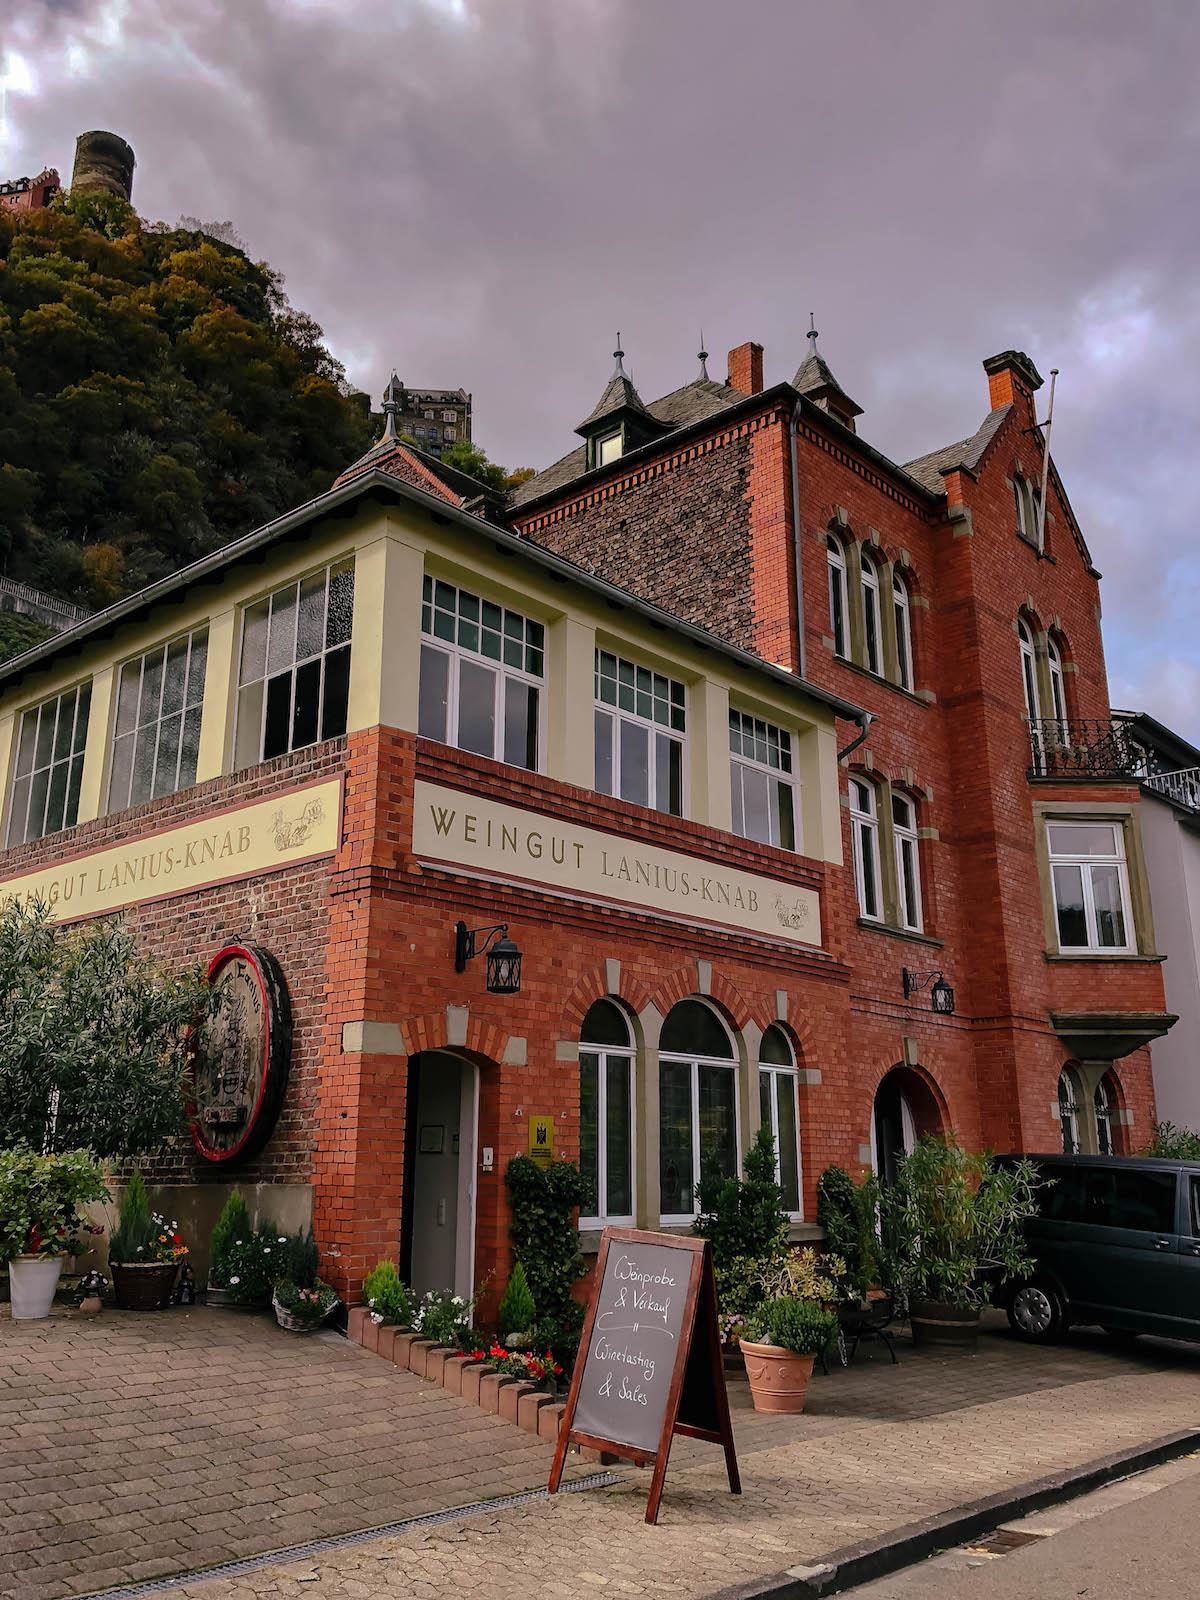 Lanius Knab Winery Germany